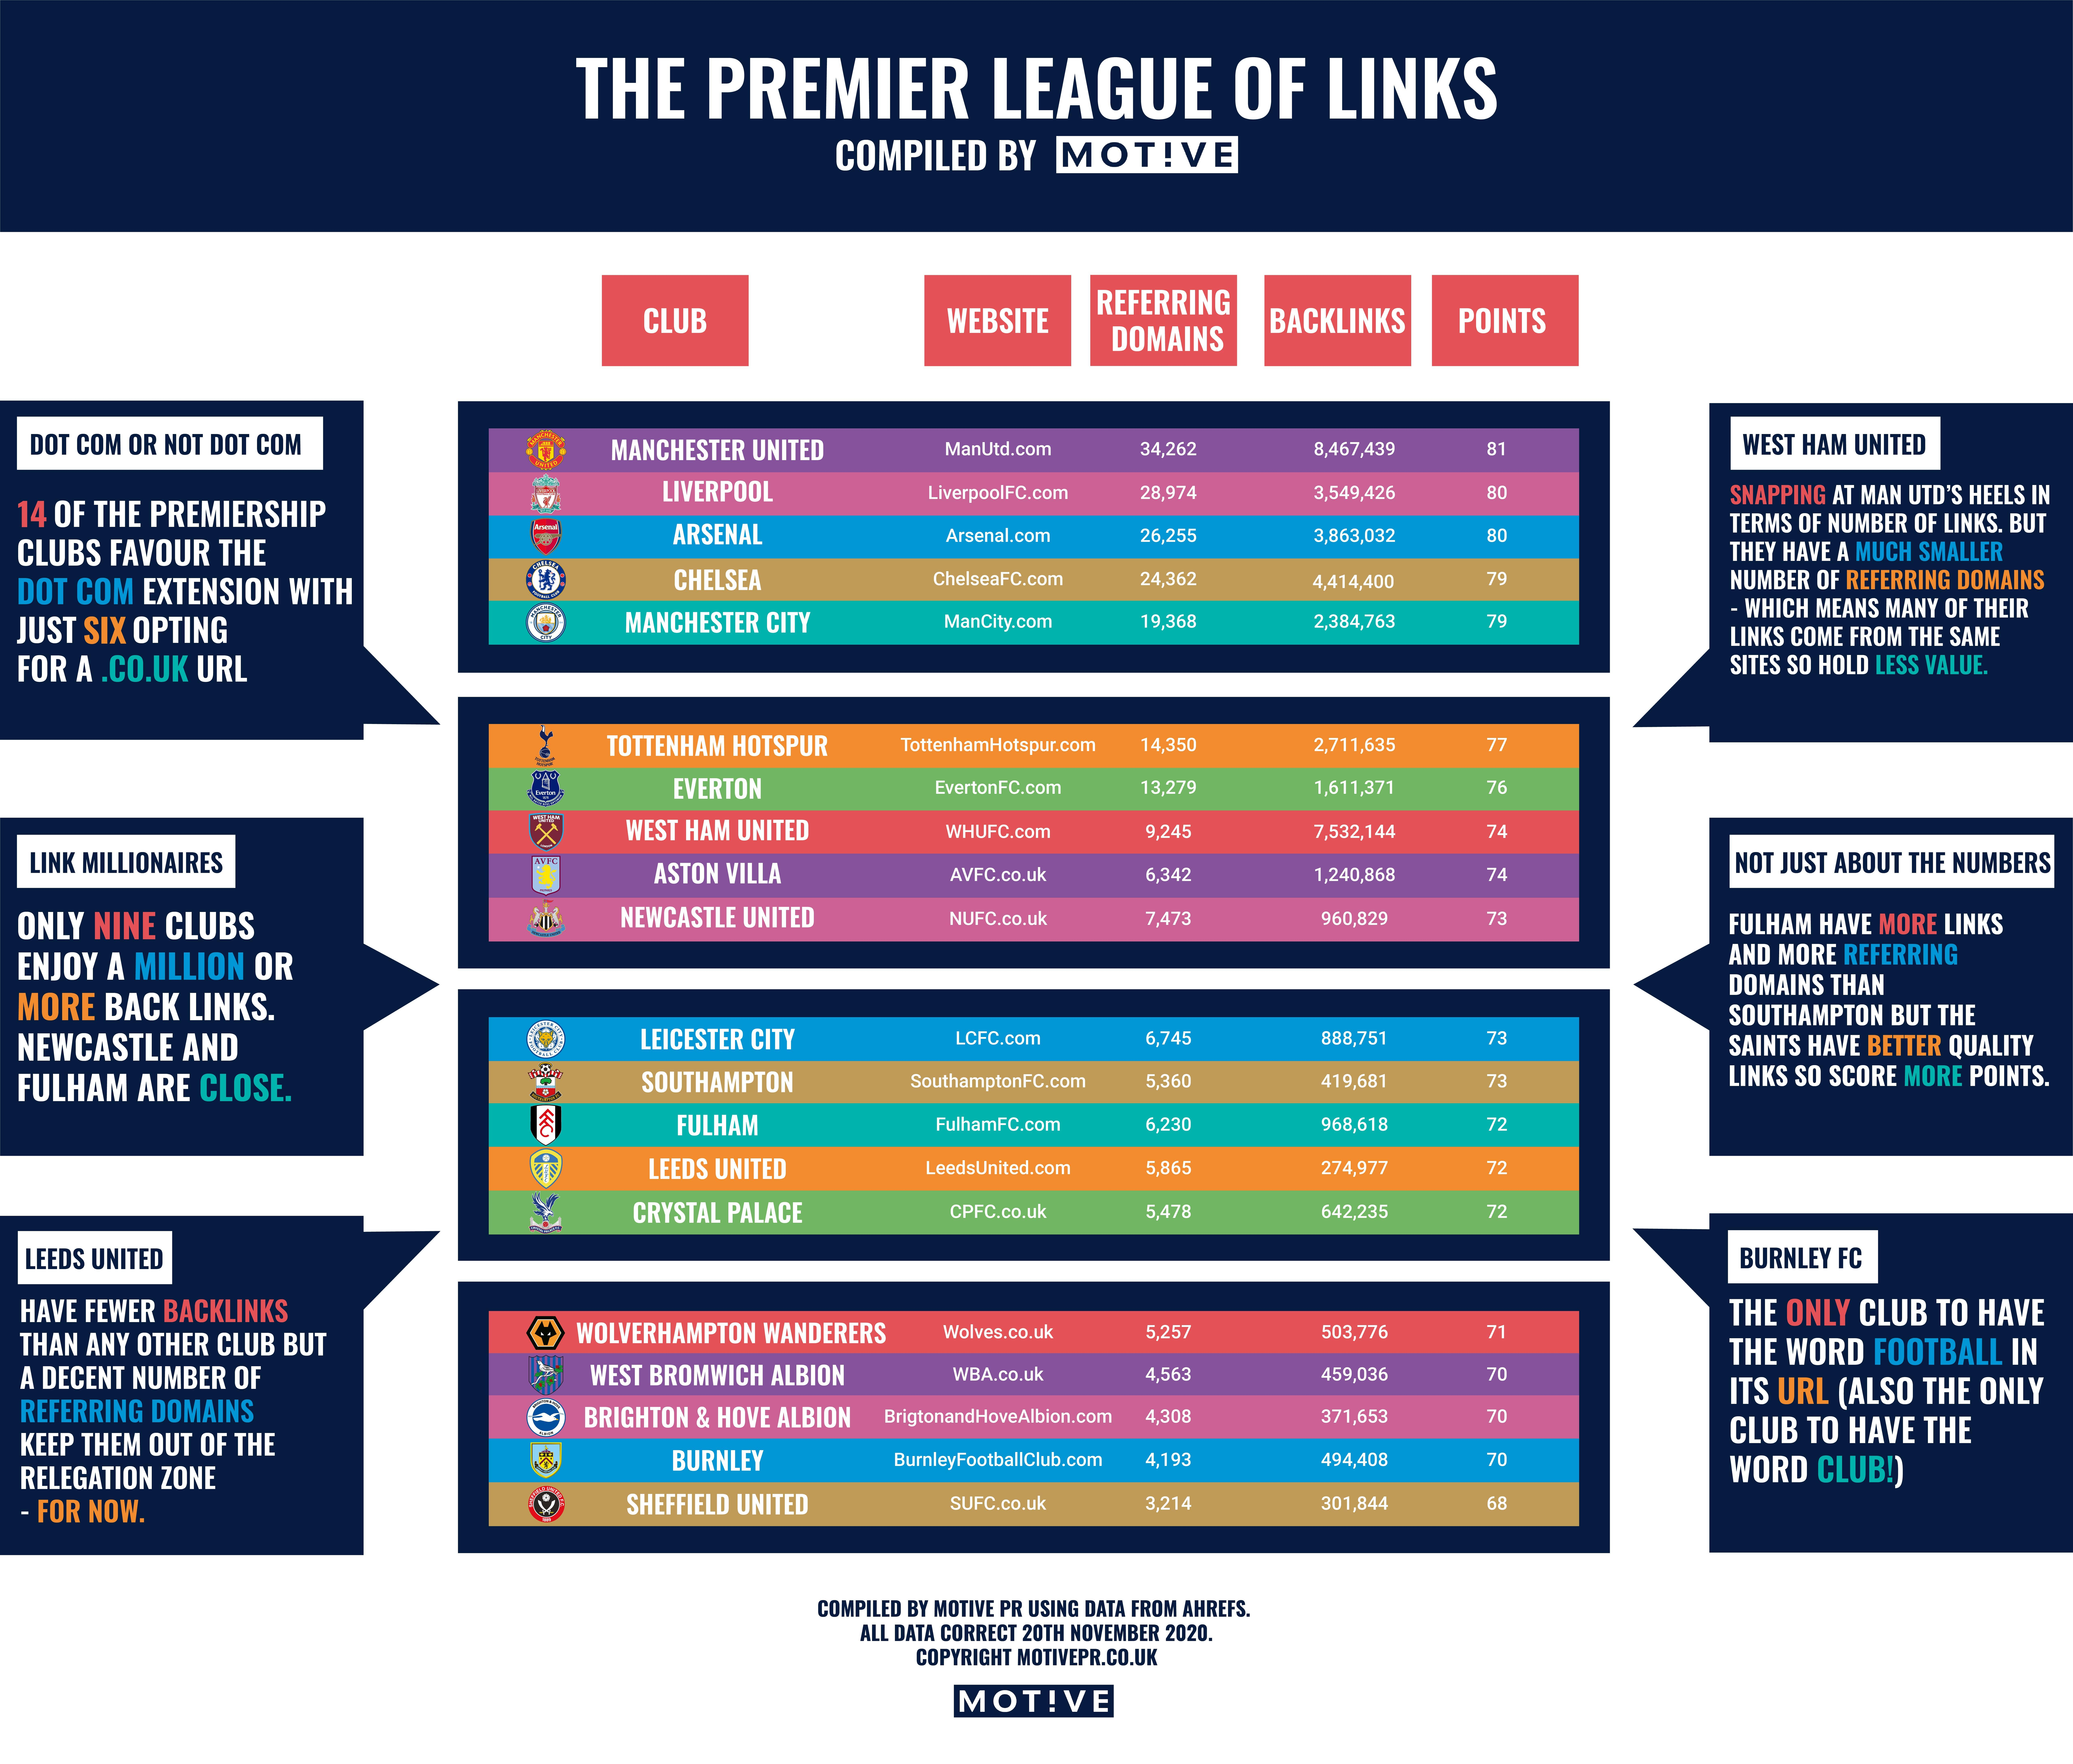 The Premier League of Links